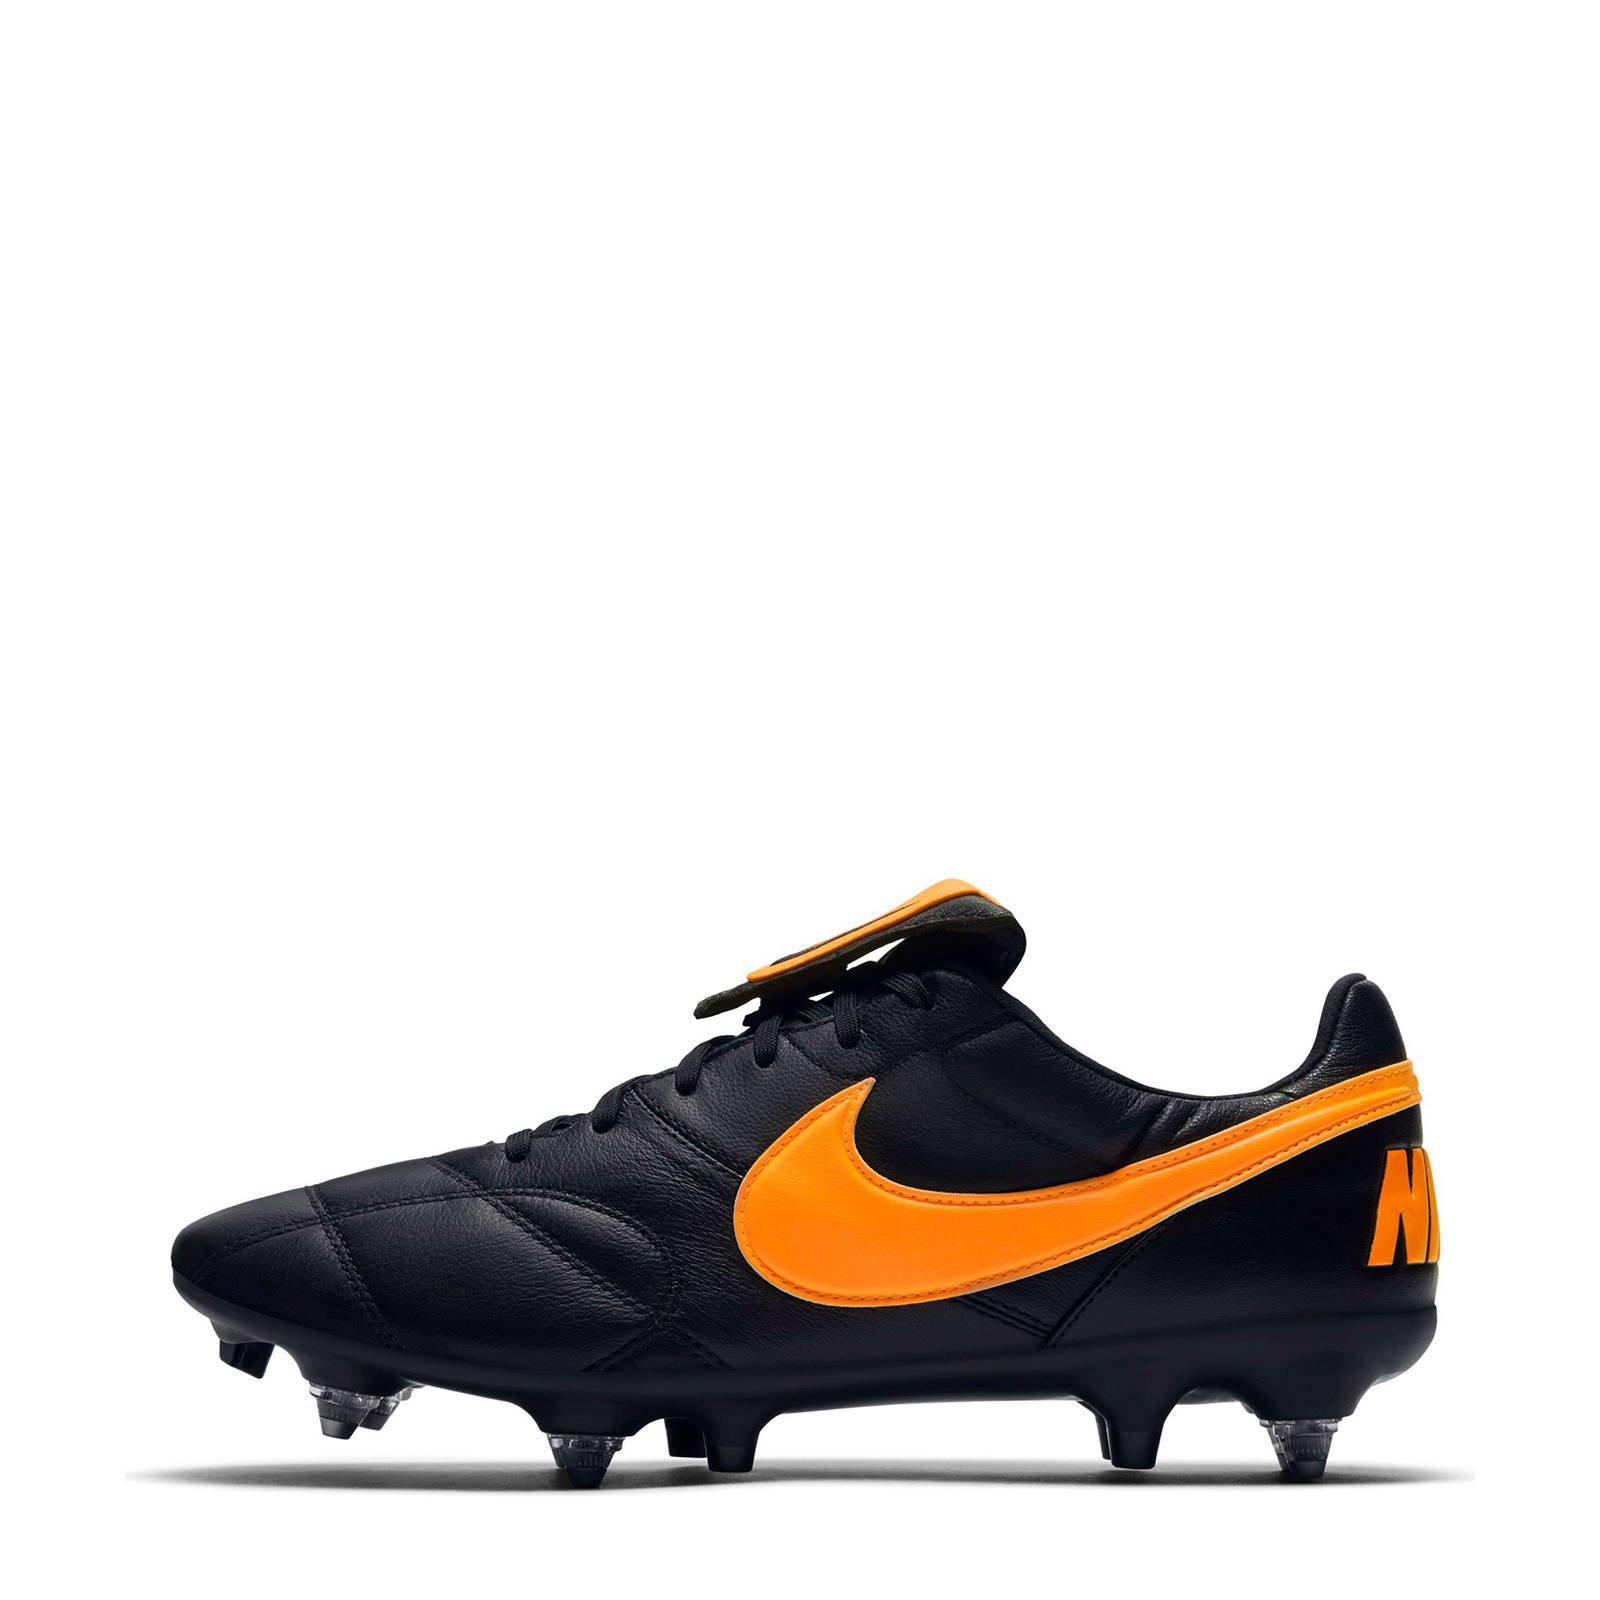 The Nike Premier SG PRO AC Sr. voetbalschoenen zwartoranje